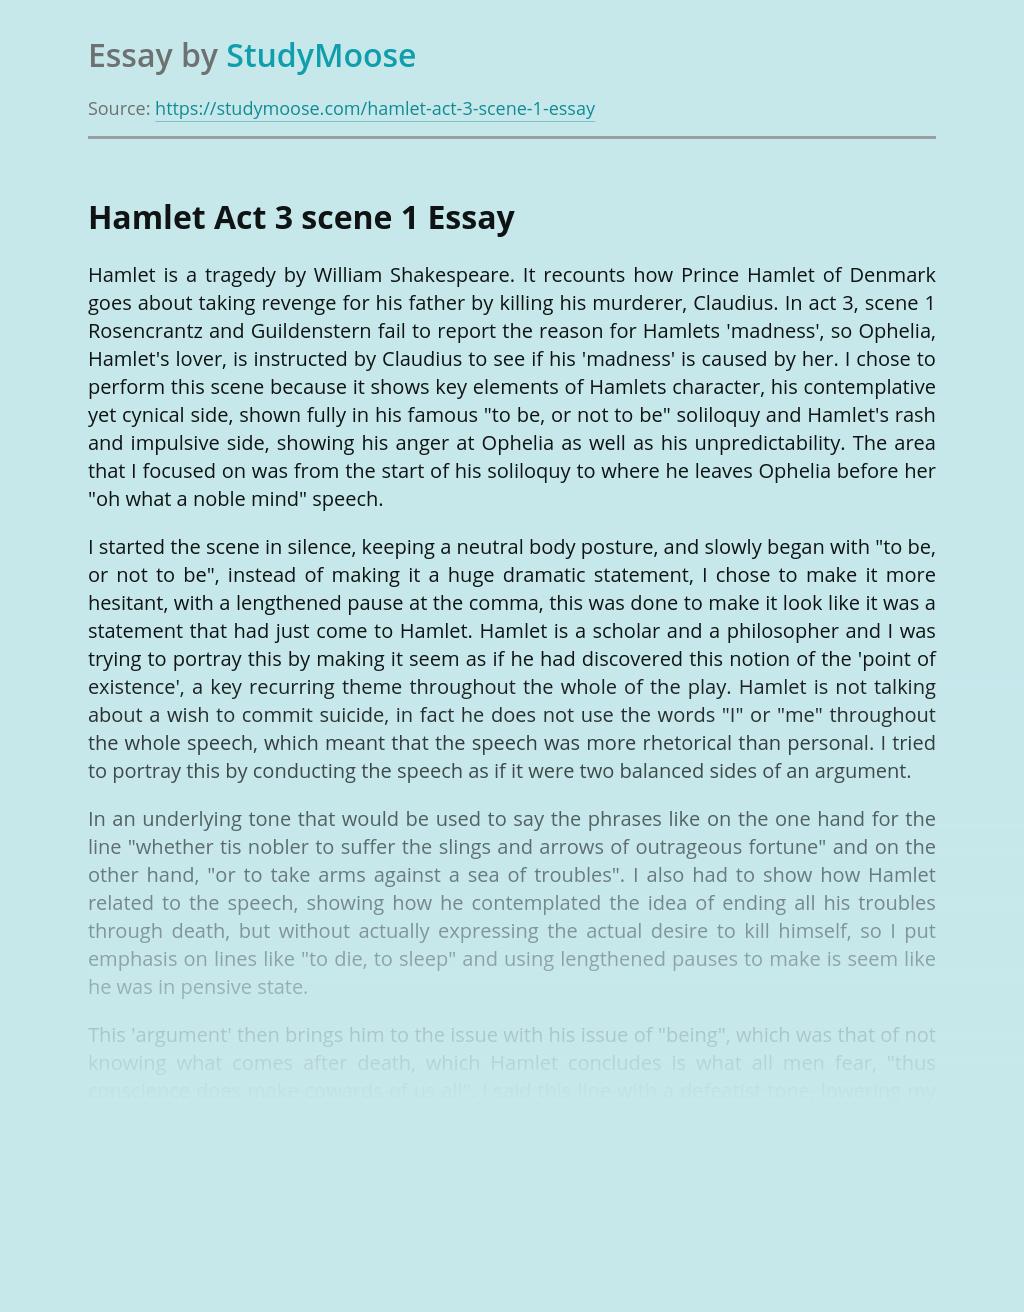 Hamlet Act 3 scene 1